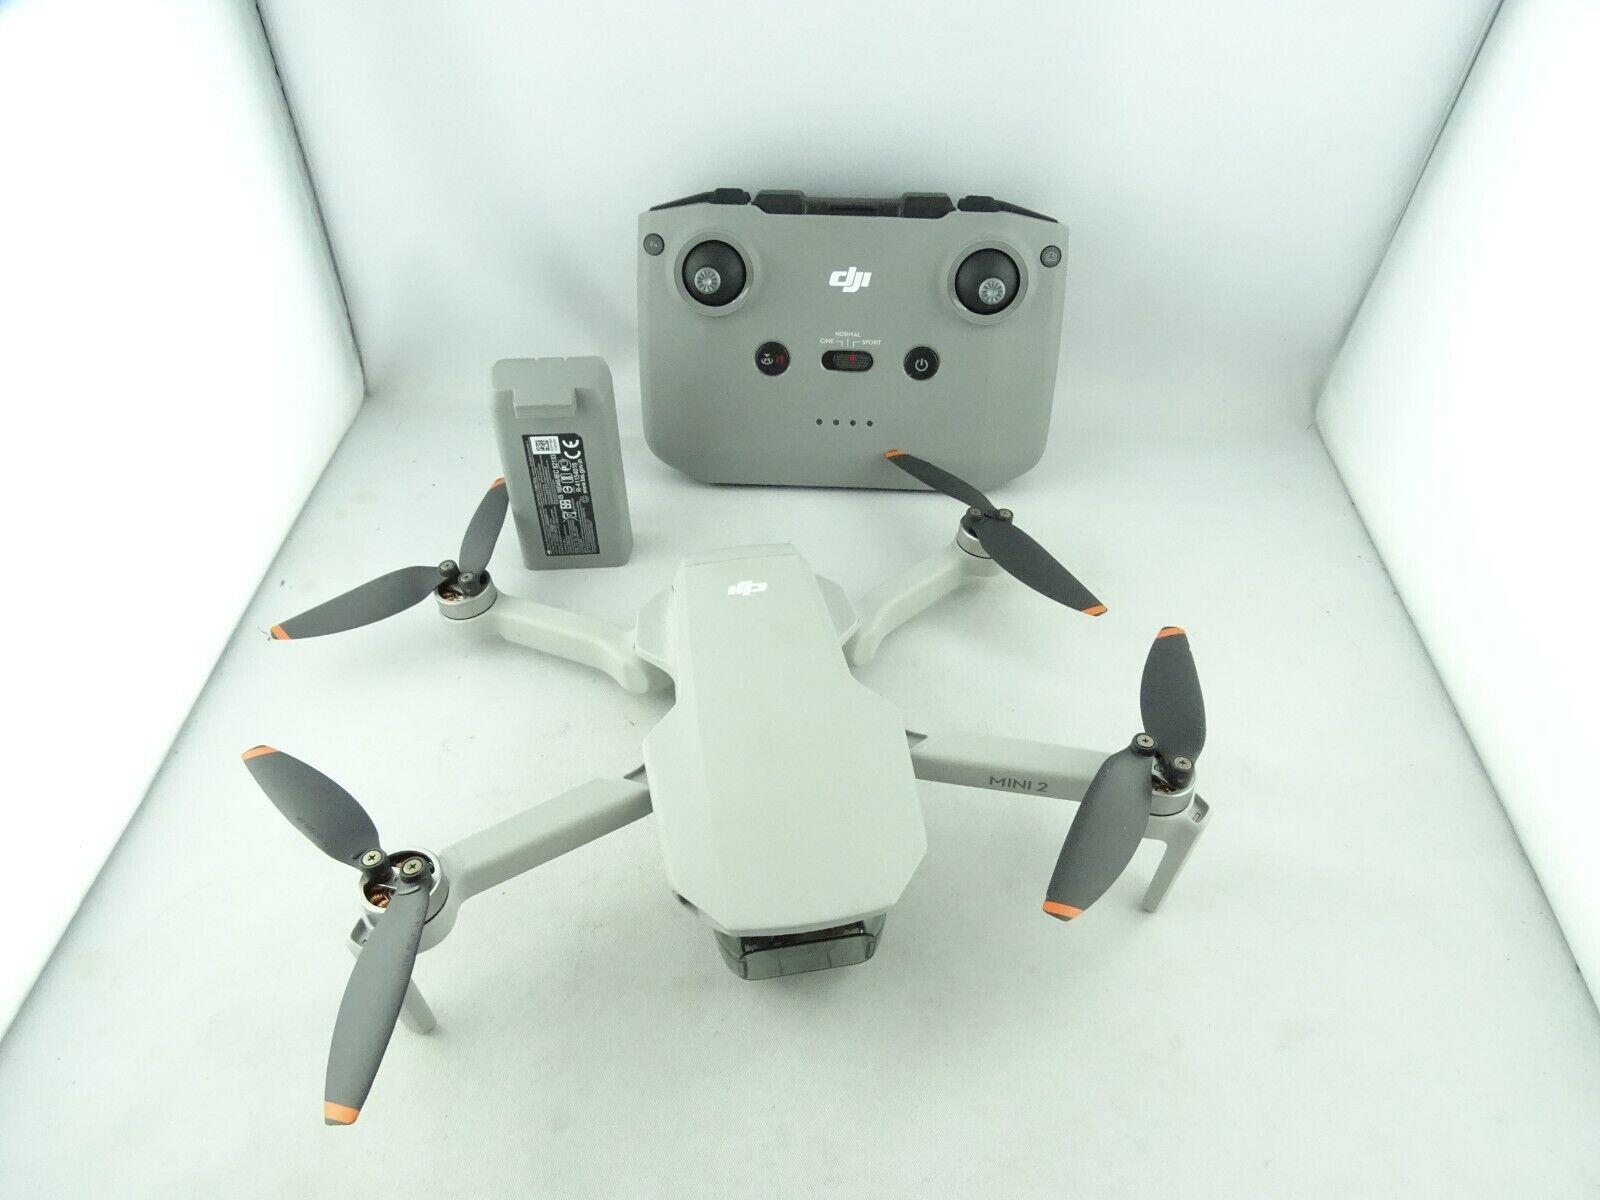 DJI Mini 2 Kameradrohne 12MP 4K Multicopter Quadrocopter Drone - Gebraucht